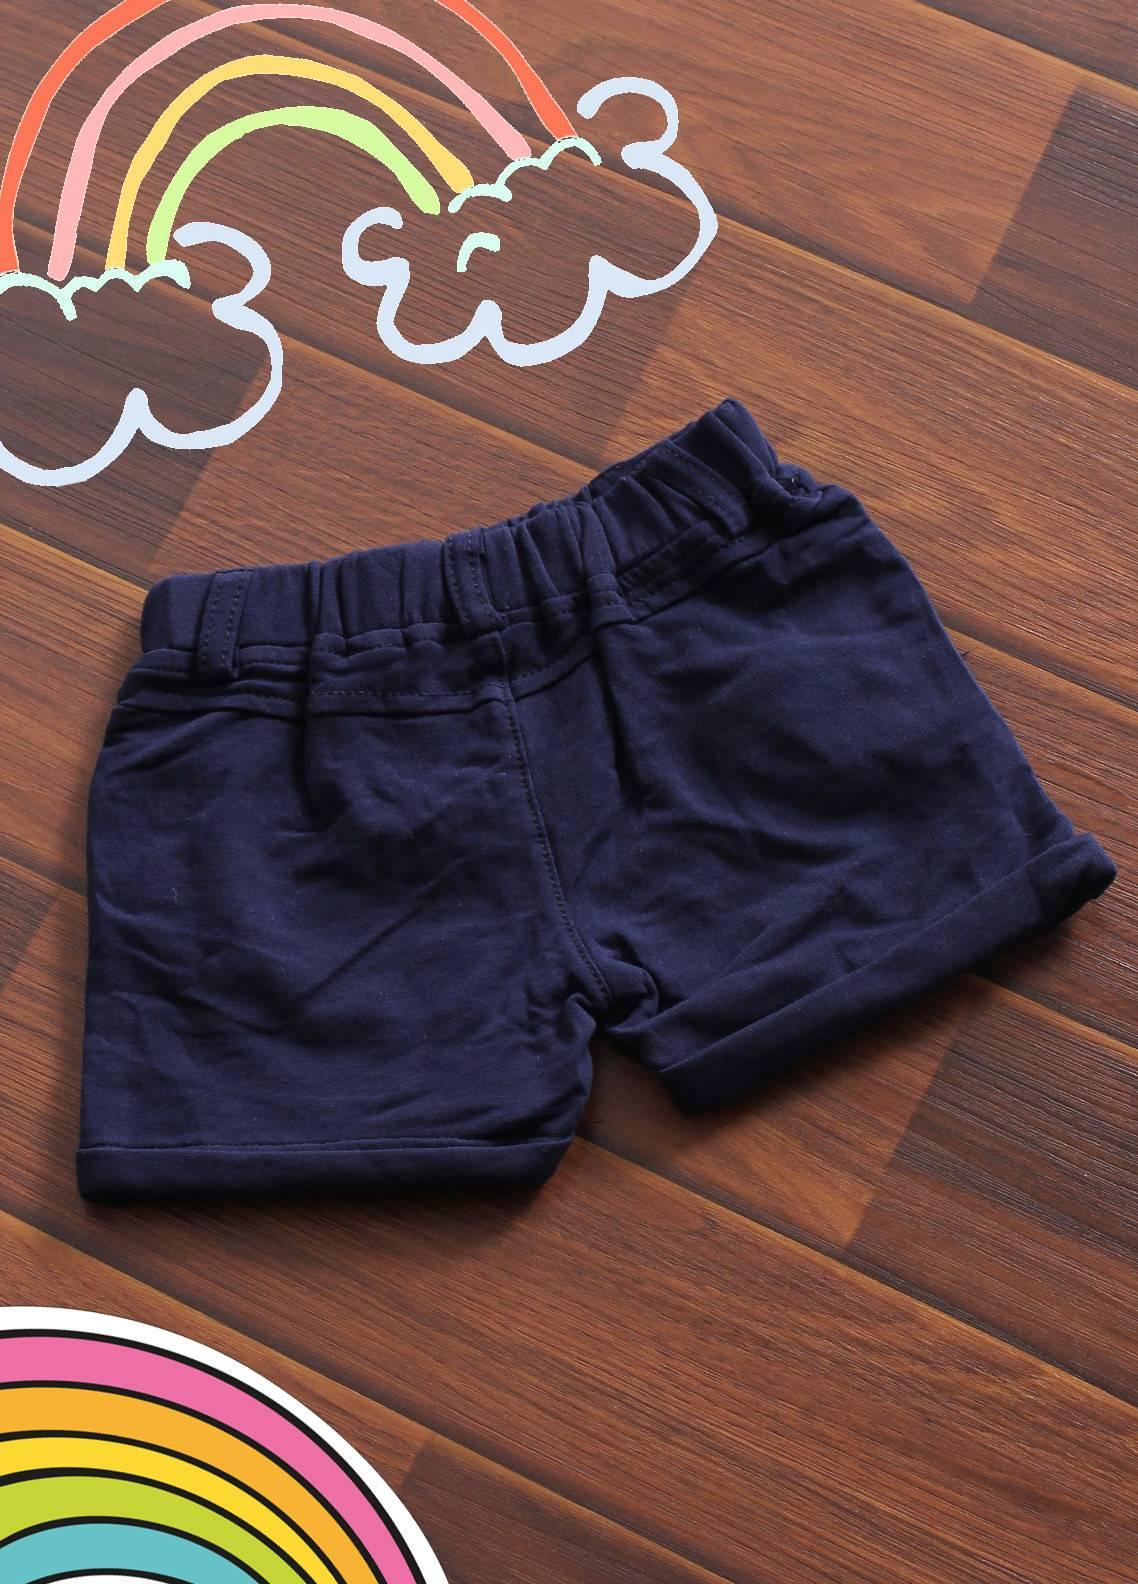 Sanaulla Exclusive Range Denim Casual Boys Shorts -  19020 Dark Blue